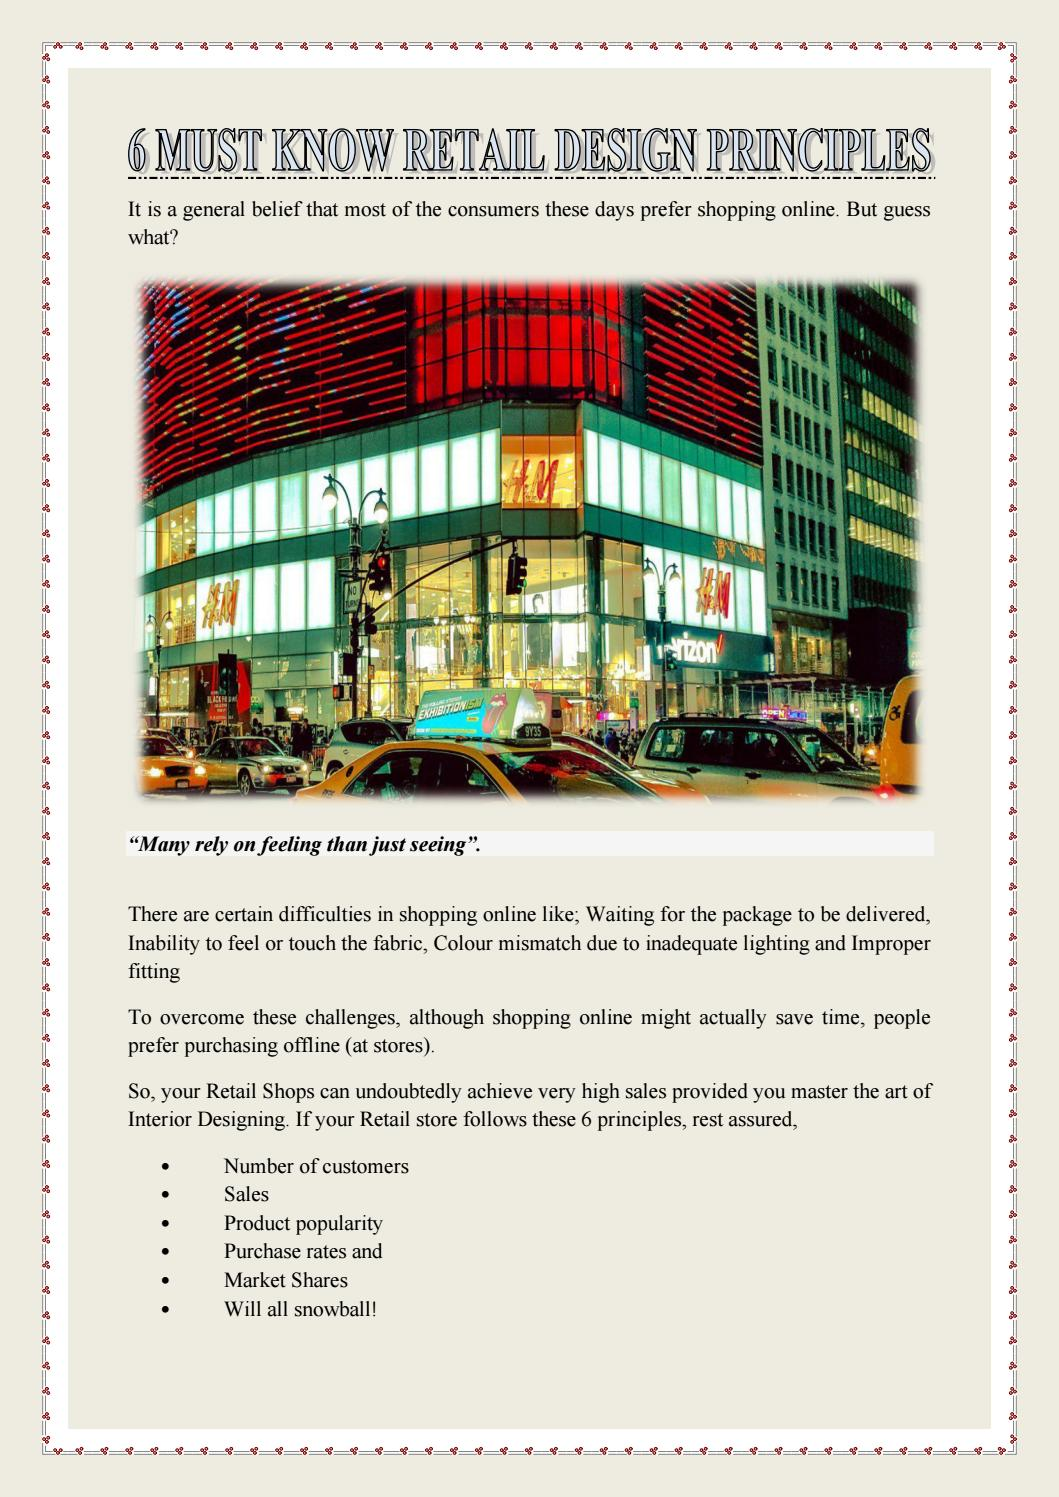 6 Must Know Retail Design Principles By Hts Interior Design Llc Issuu